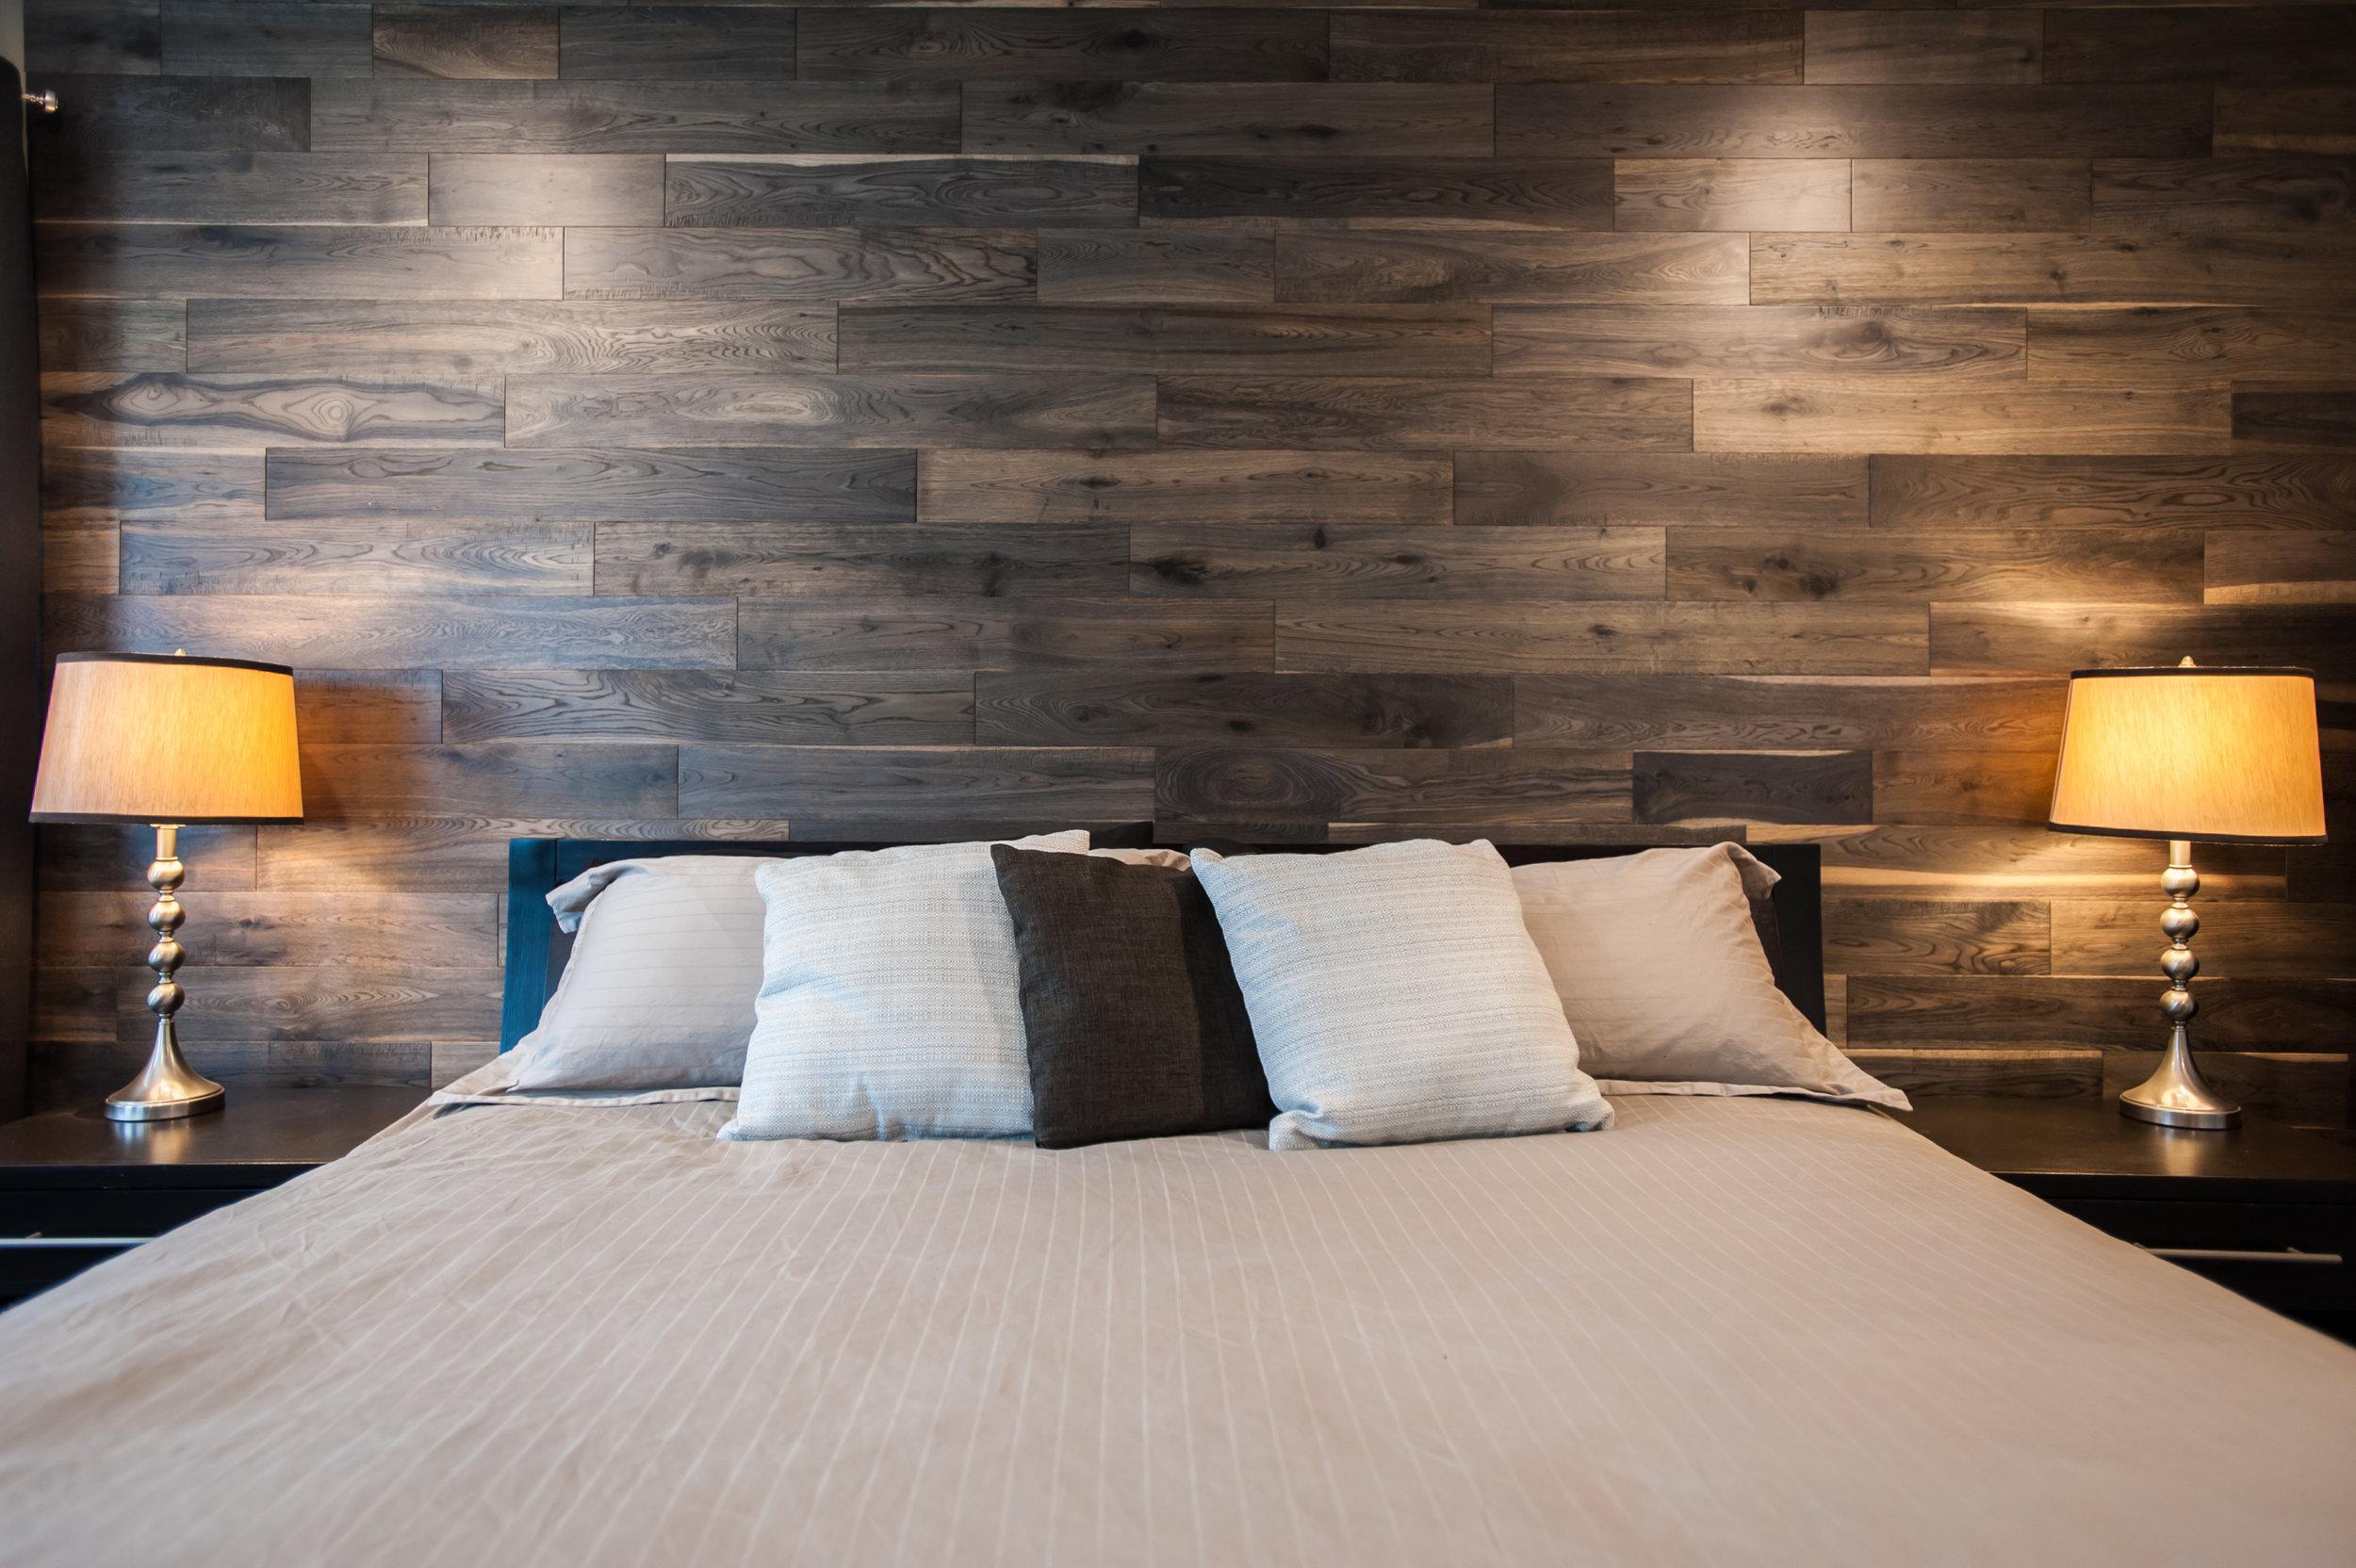 stickwood bedroom